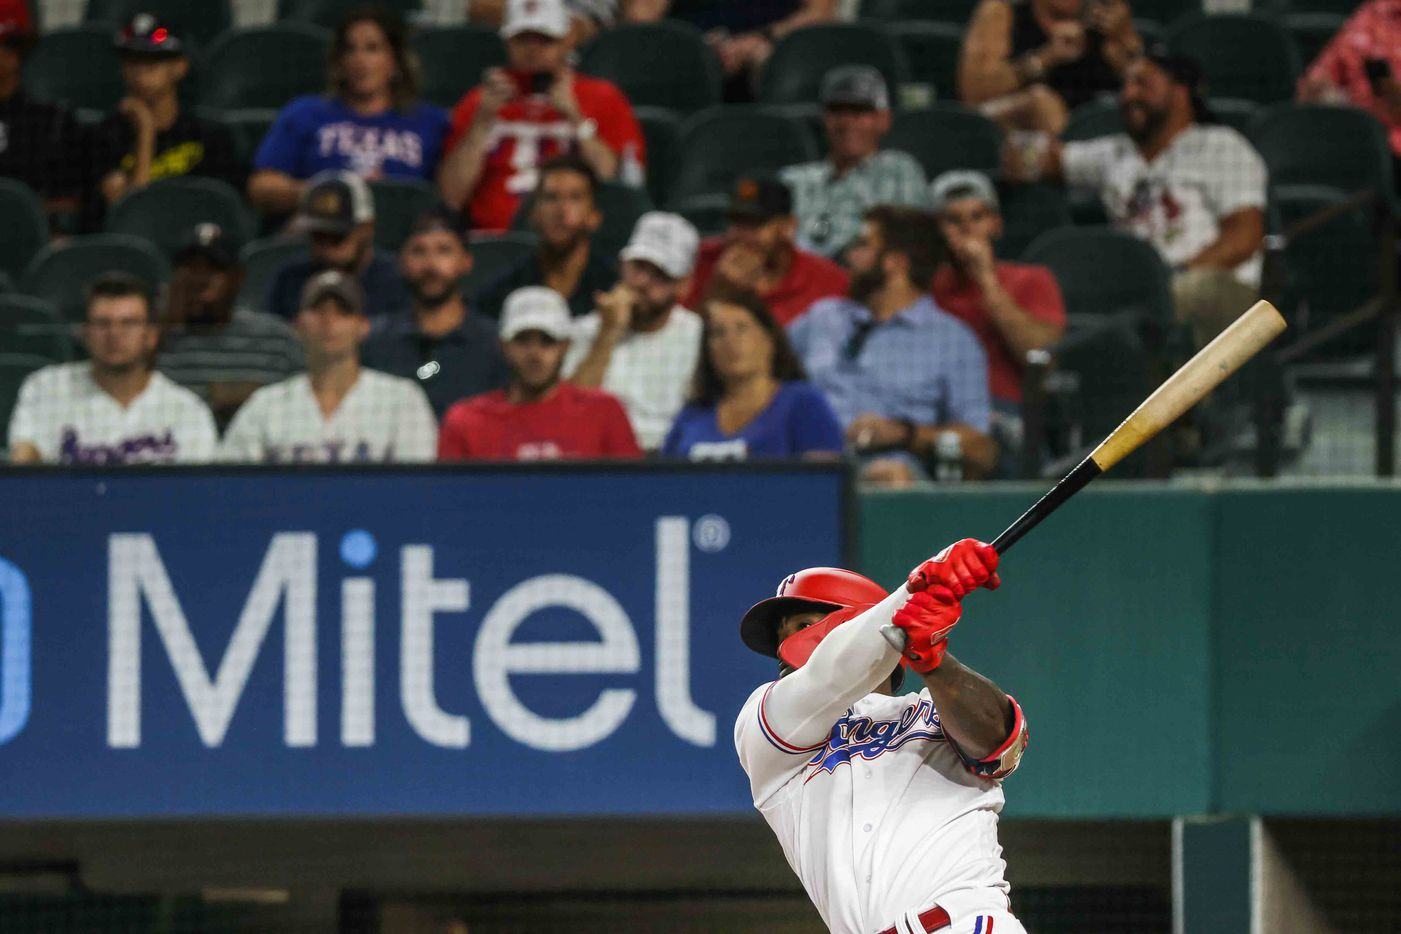 Adolis Garcia (53) bats during Arizona Diamondbacks at Texas Rangers game at the Globe Life Field in Arlington, Texas on Wednesday, July 28, 2021. (Lola Gomez/The Dallas Morning News)